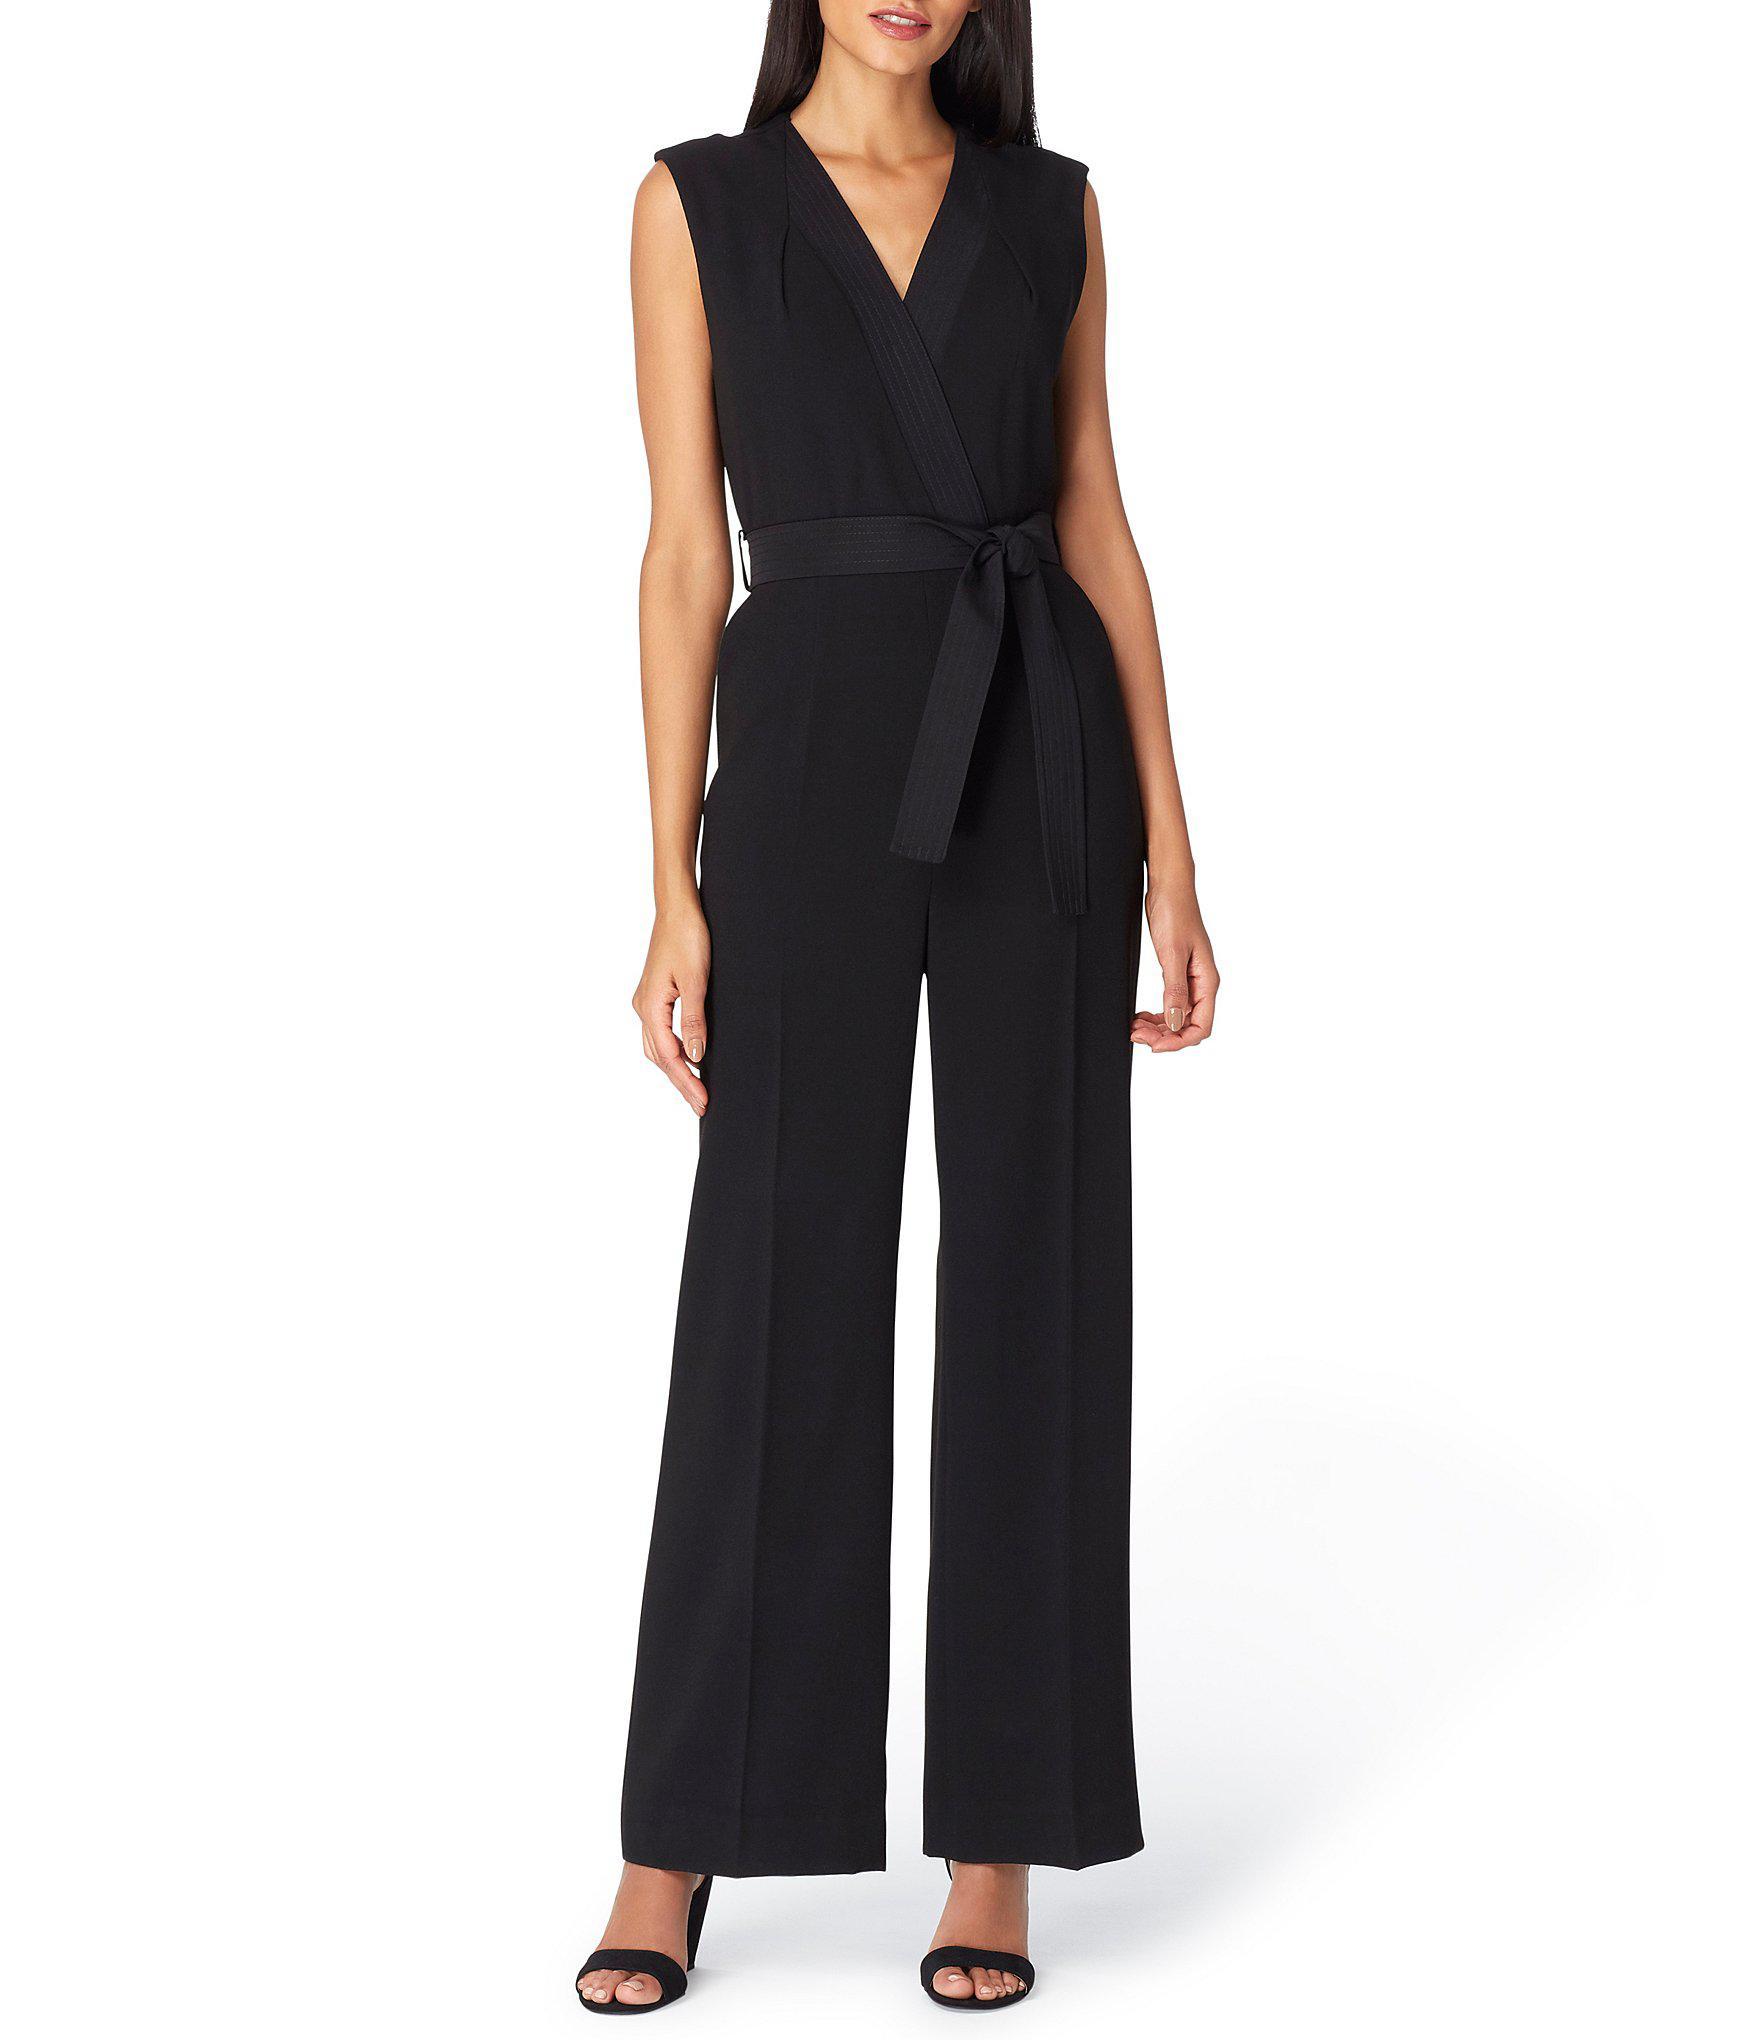 b61419576dc3 Lyst - Tahari Faux Wrap Crepe Jumpsuit in Black